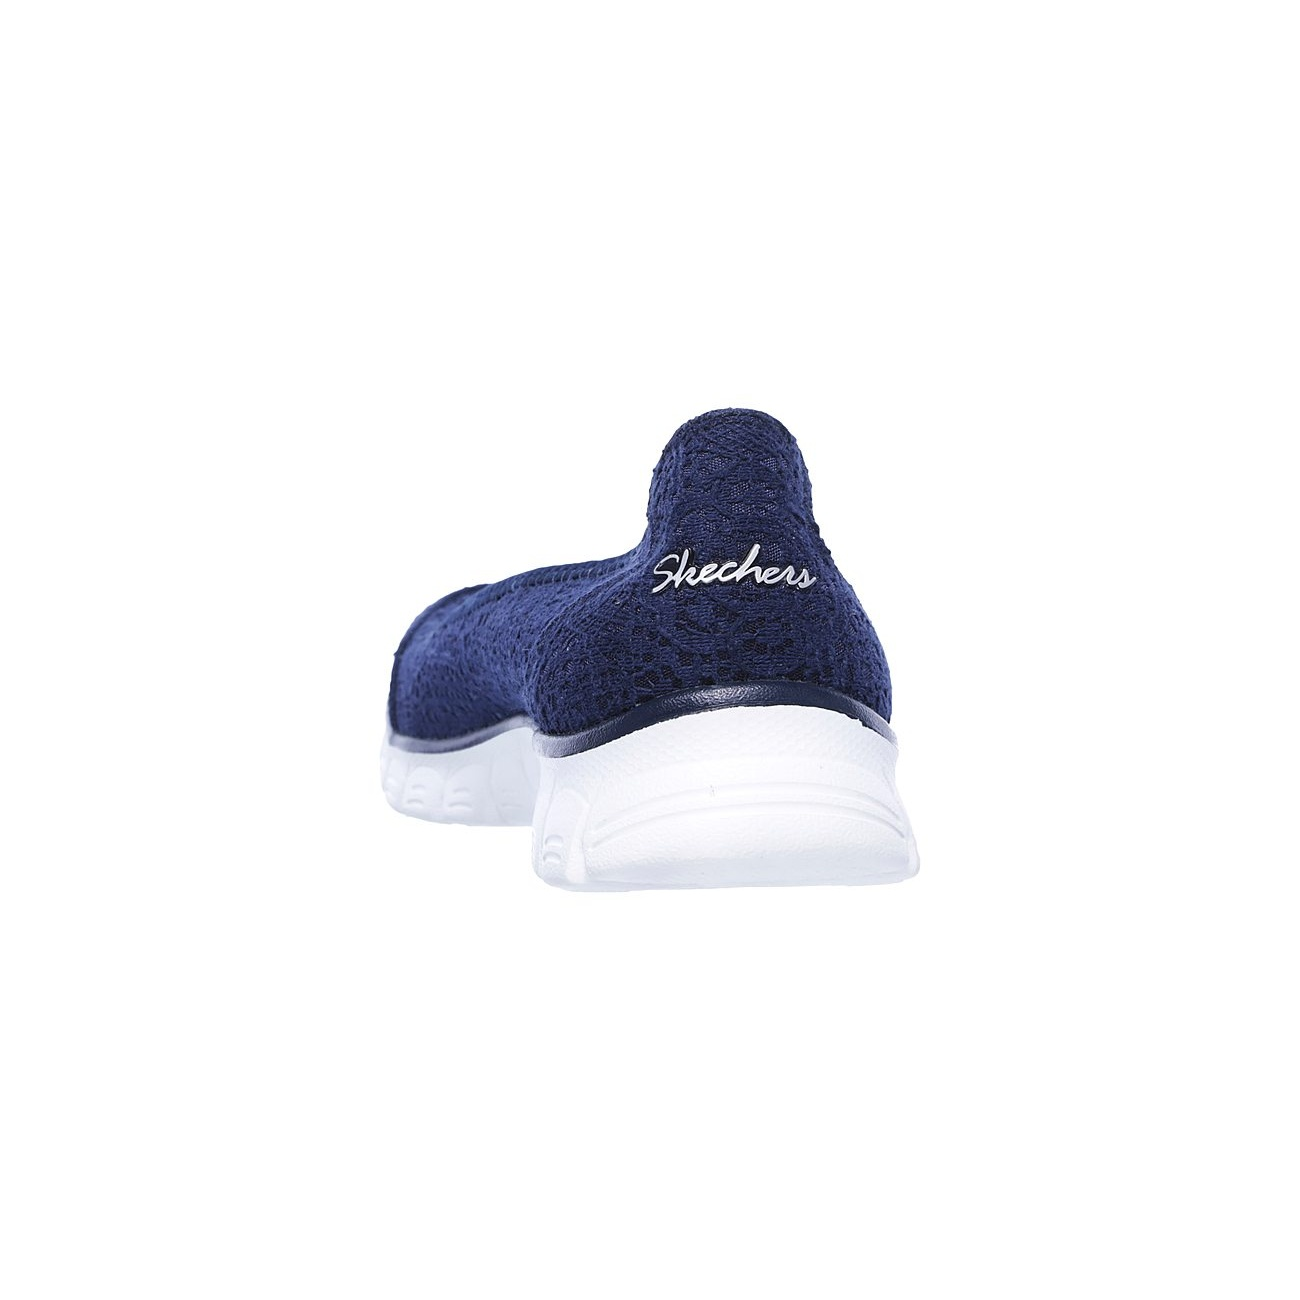 Skechers-Bailarinas-deportivas-de-verano-modelo-EZ-Flex-3-0-Beautify-FS5199 miniatura 5